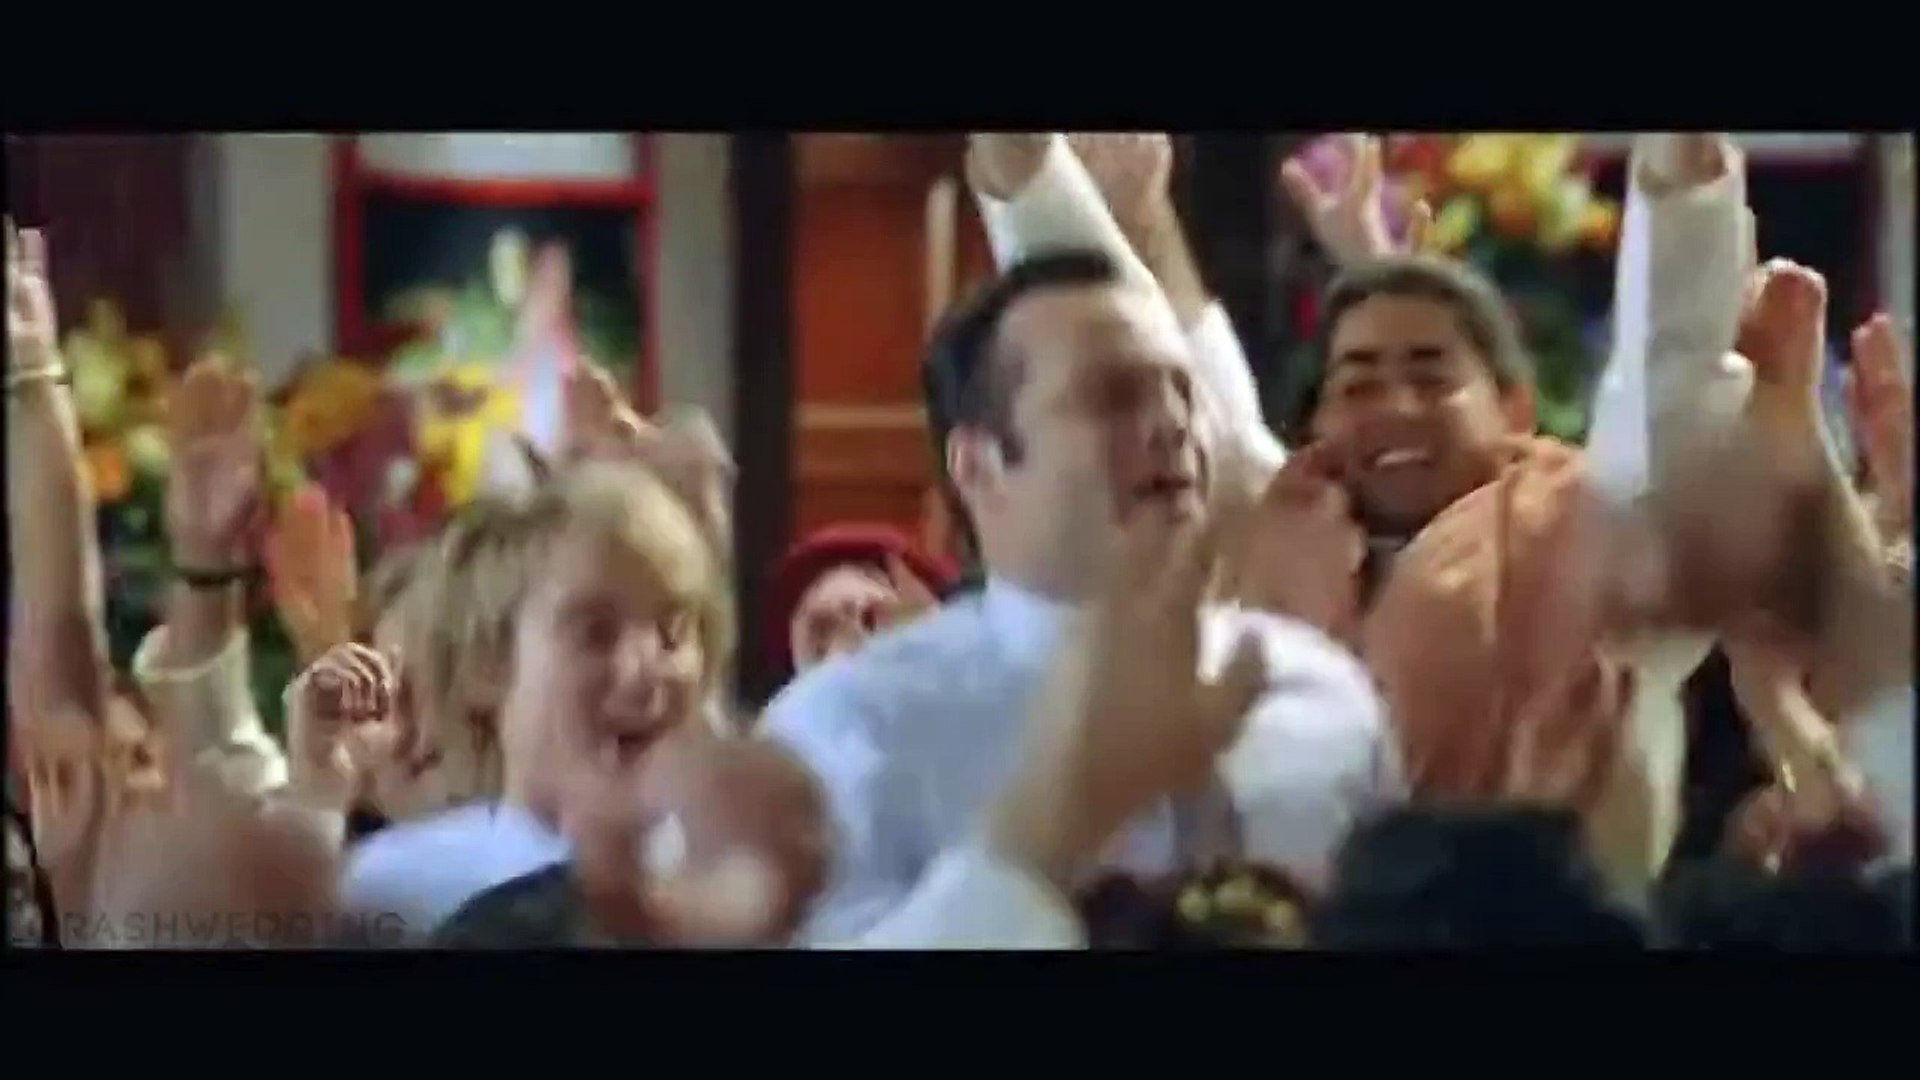 Wedding Crashers Shout Scene Hd Video Dailymotion